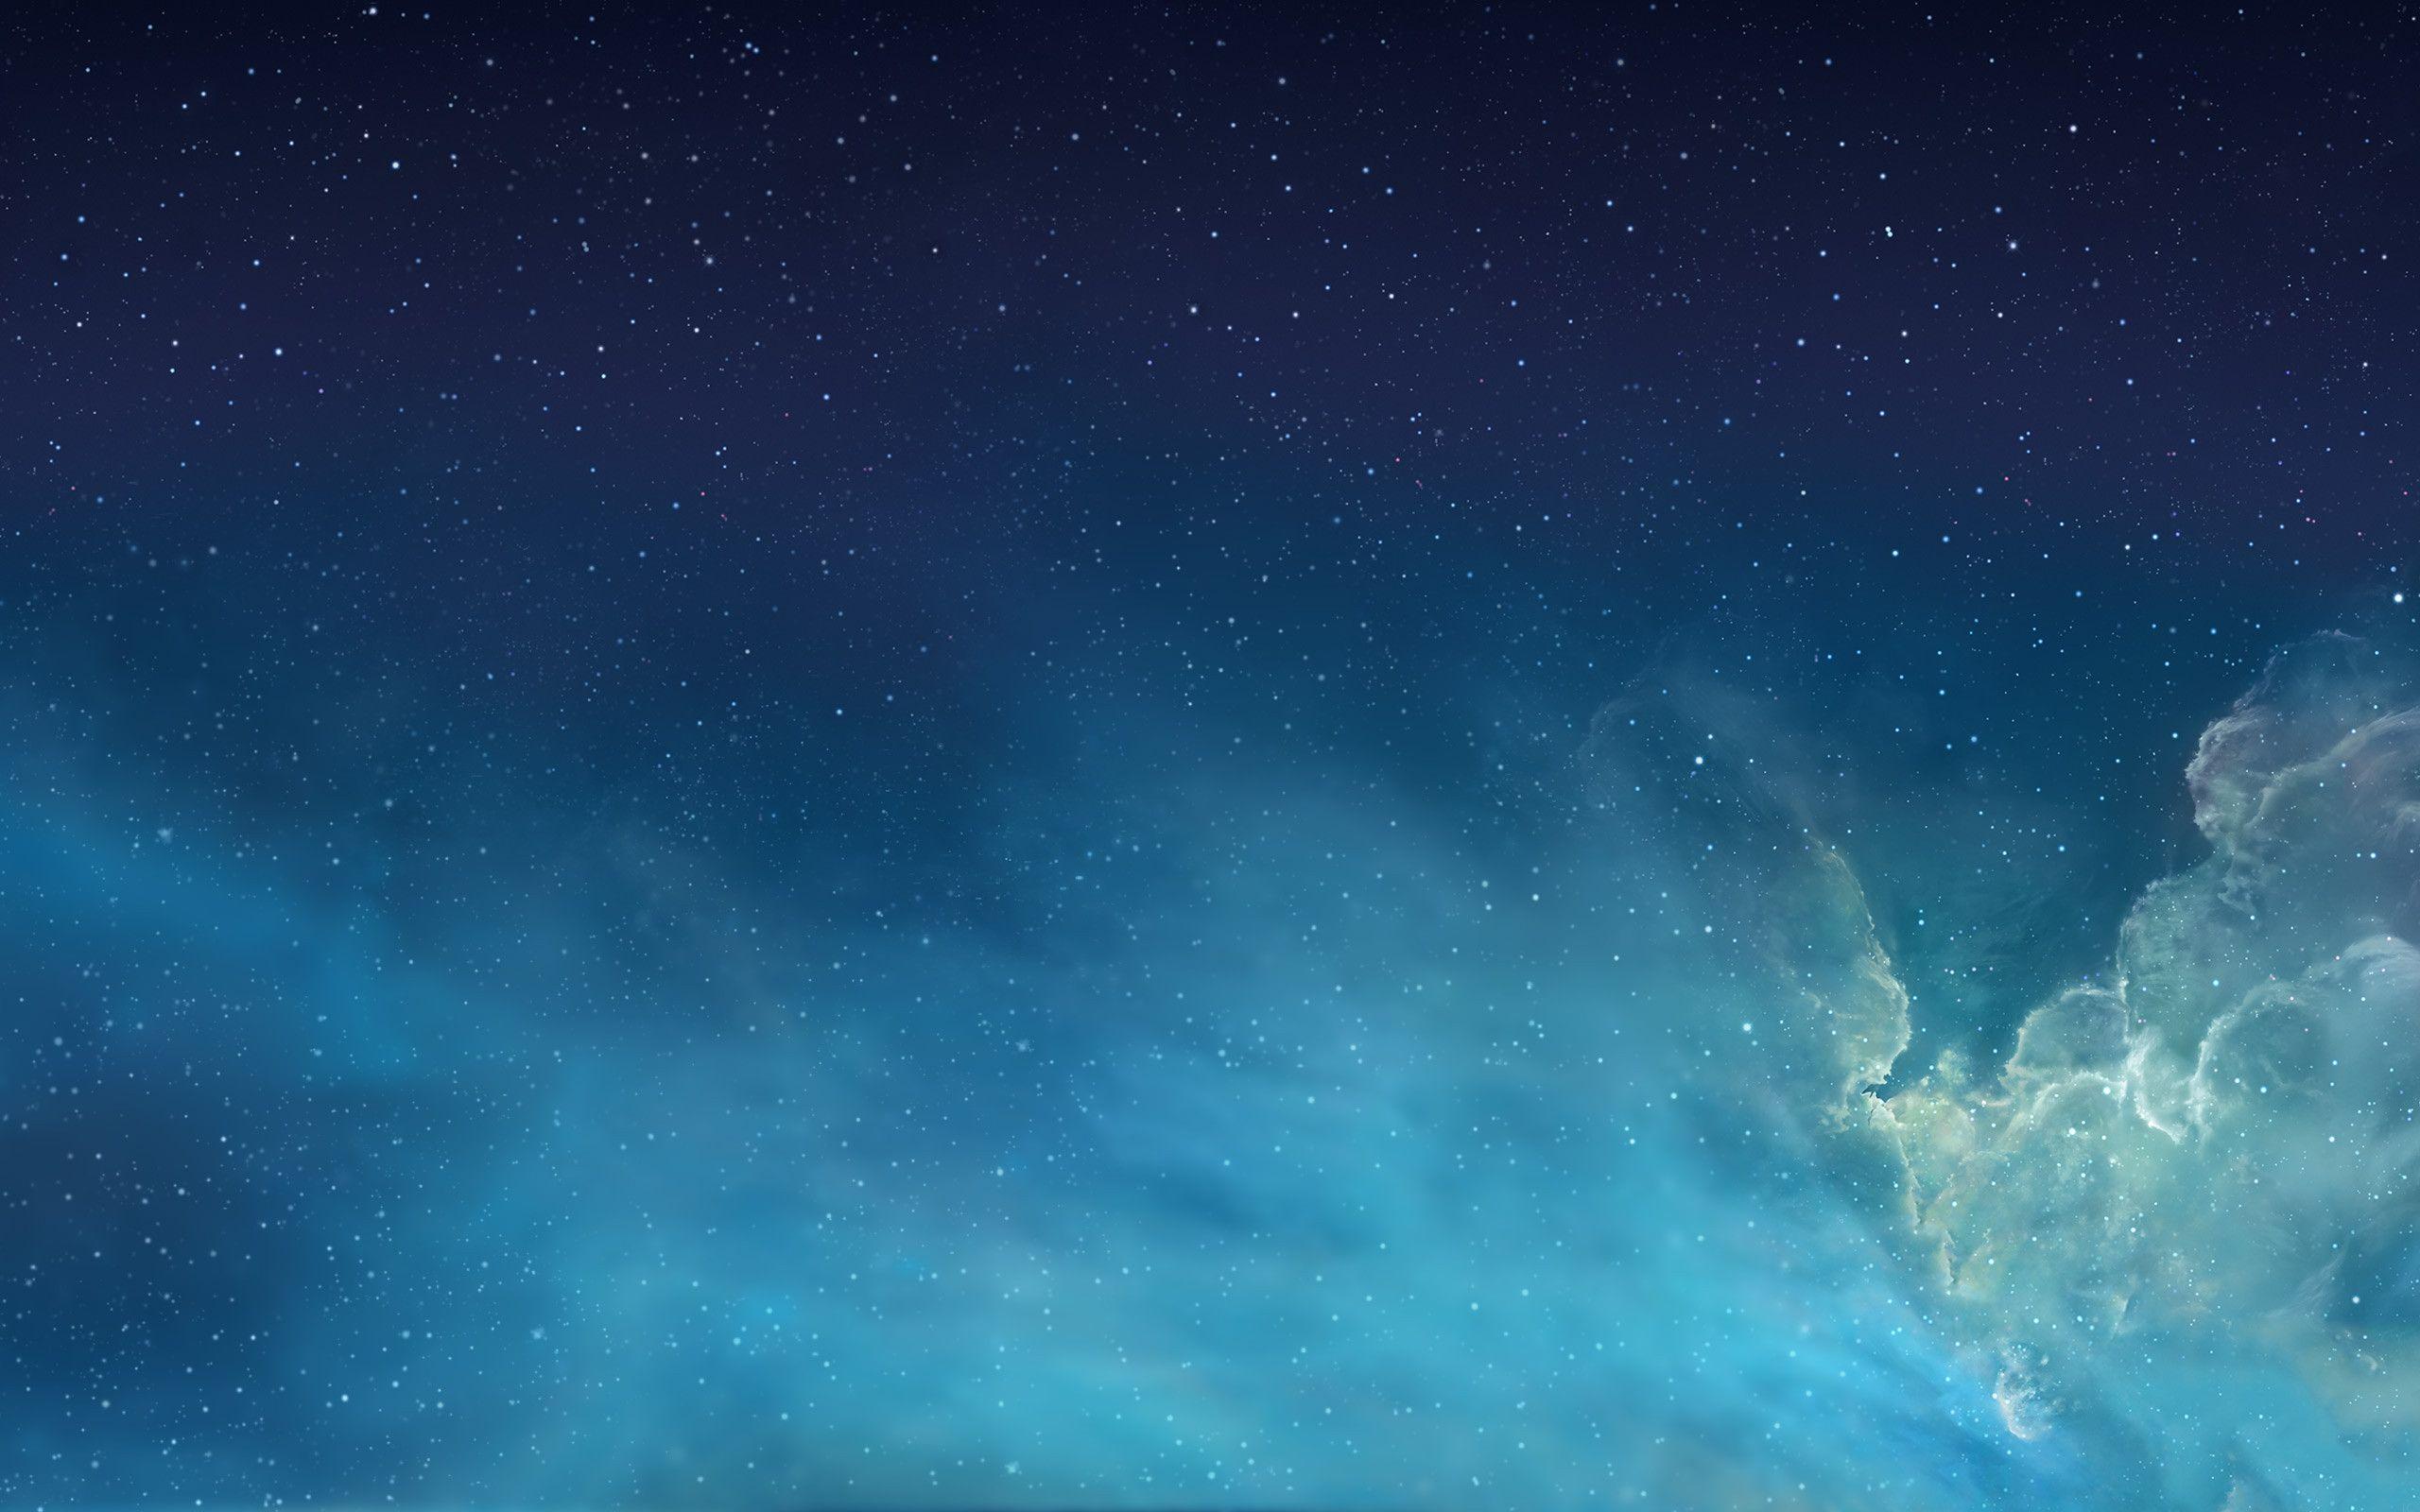 iOS7 Wallpaper (2560×1600) 壁紙, 景色, 風景